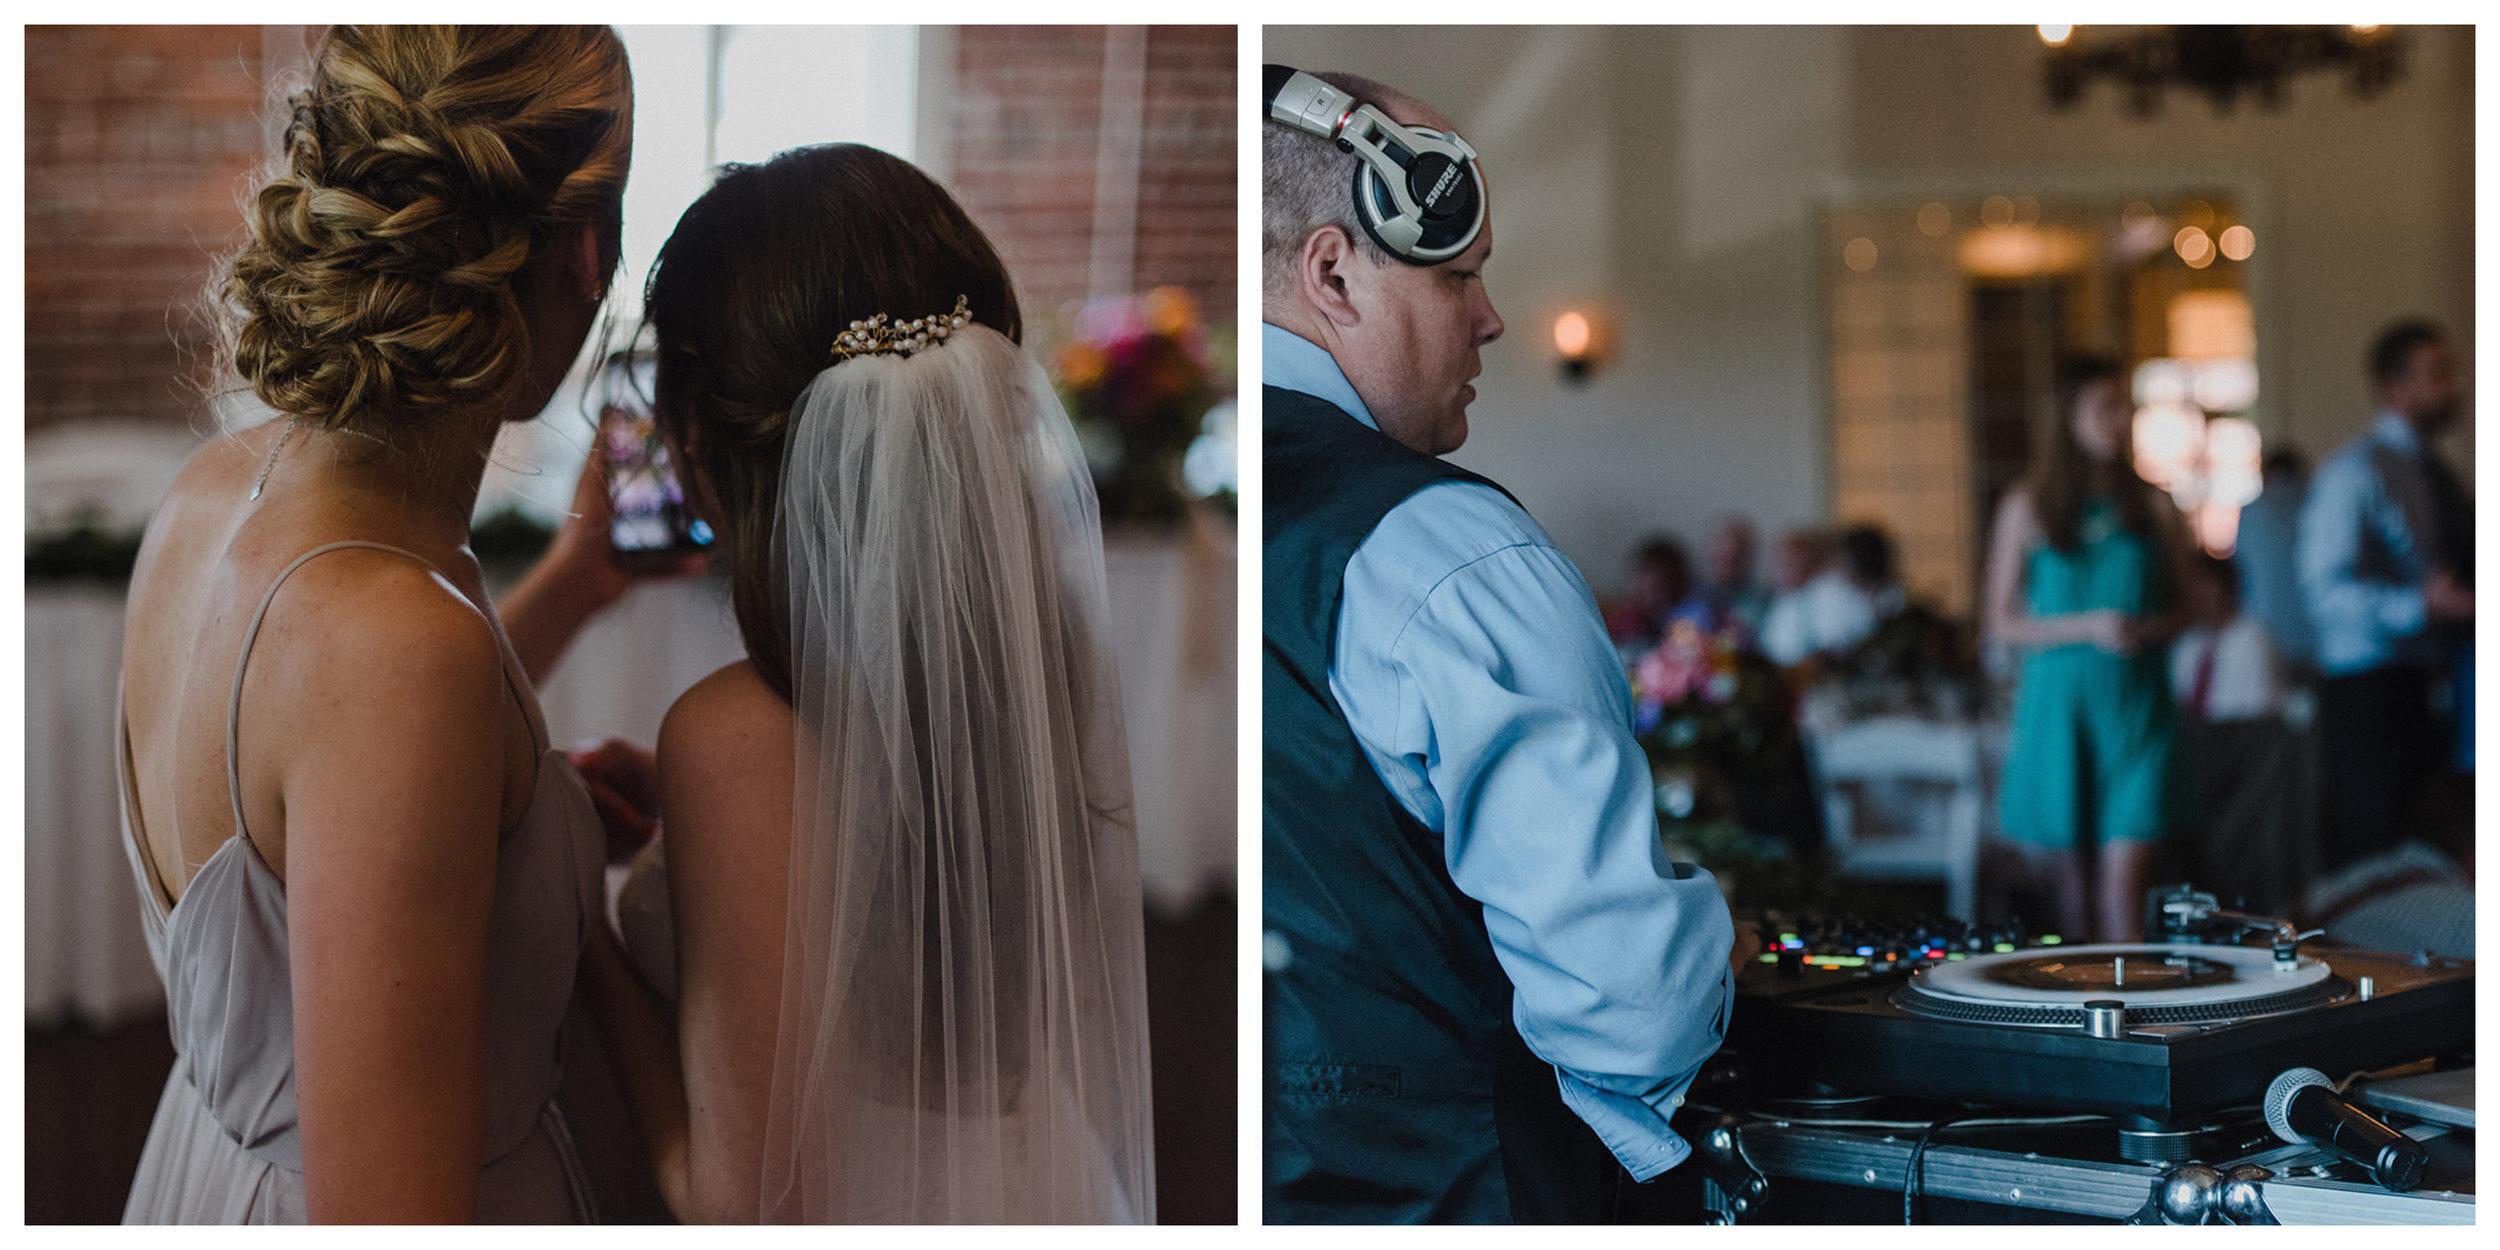 kc_wedding_dress_shop20